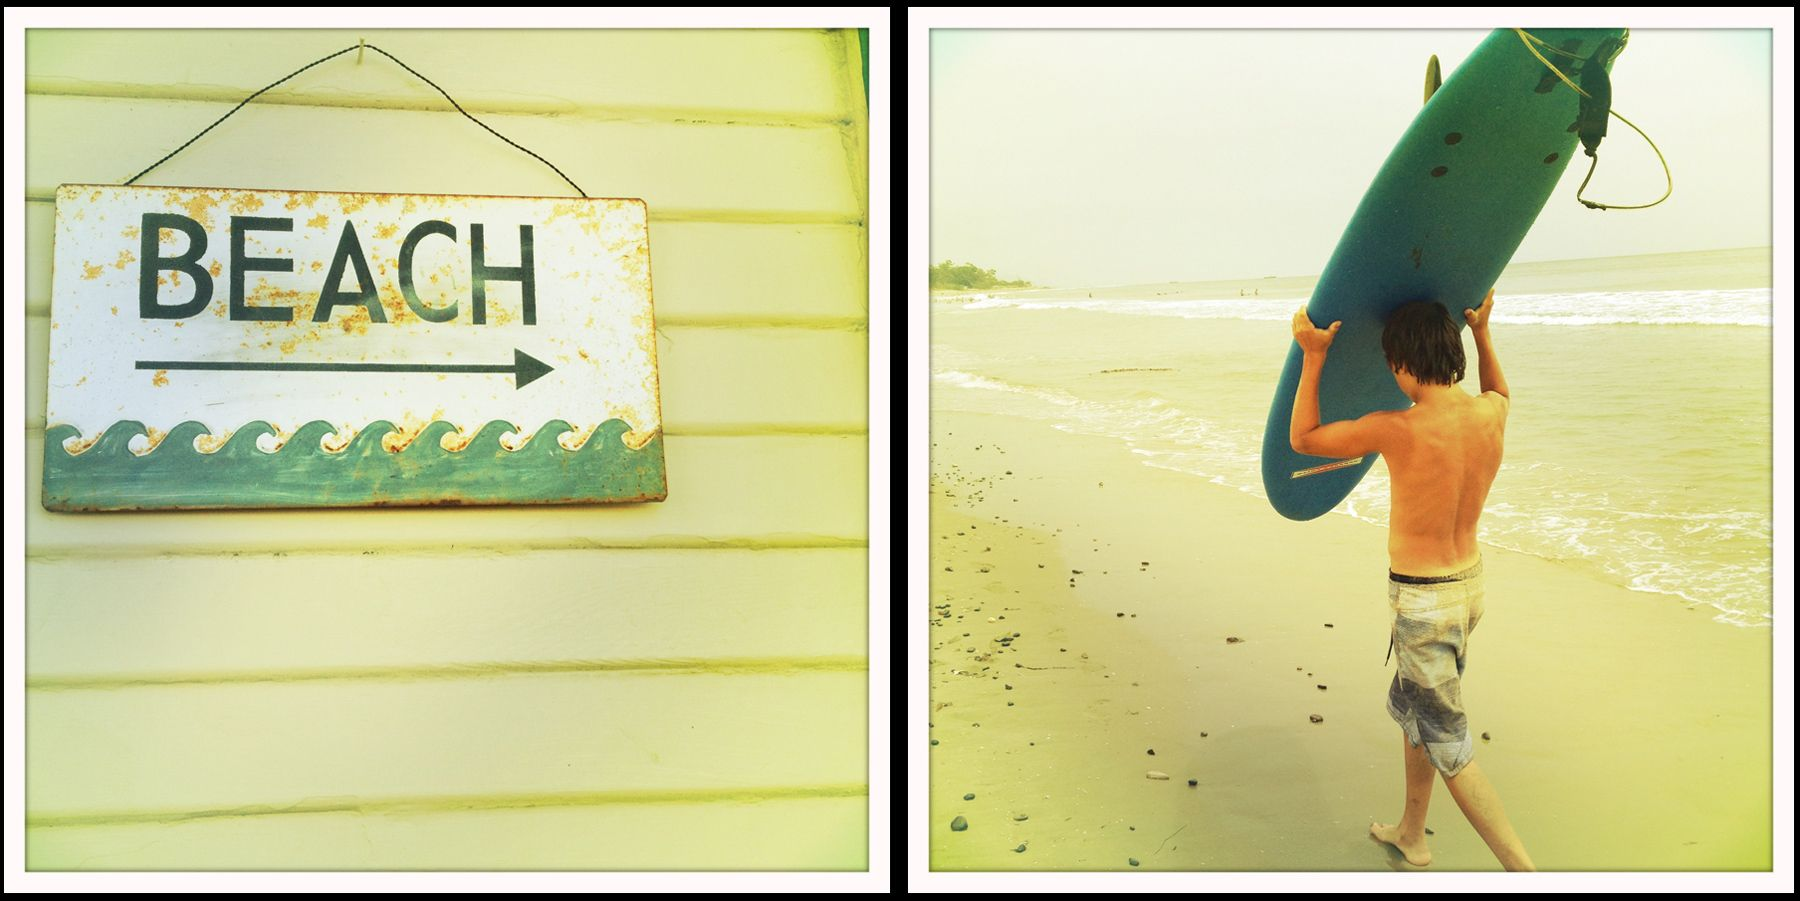 1beach_sign_surfer.jpg